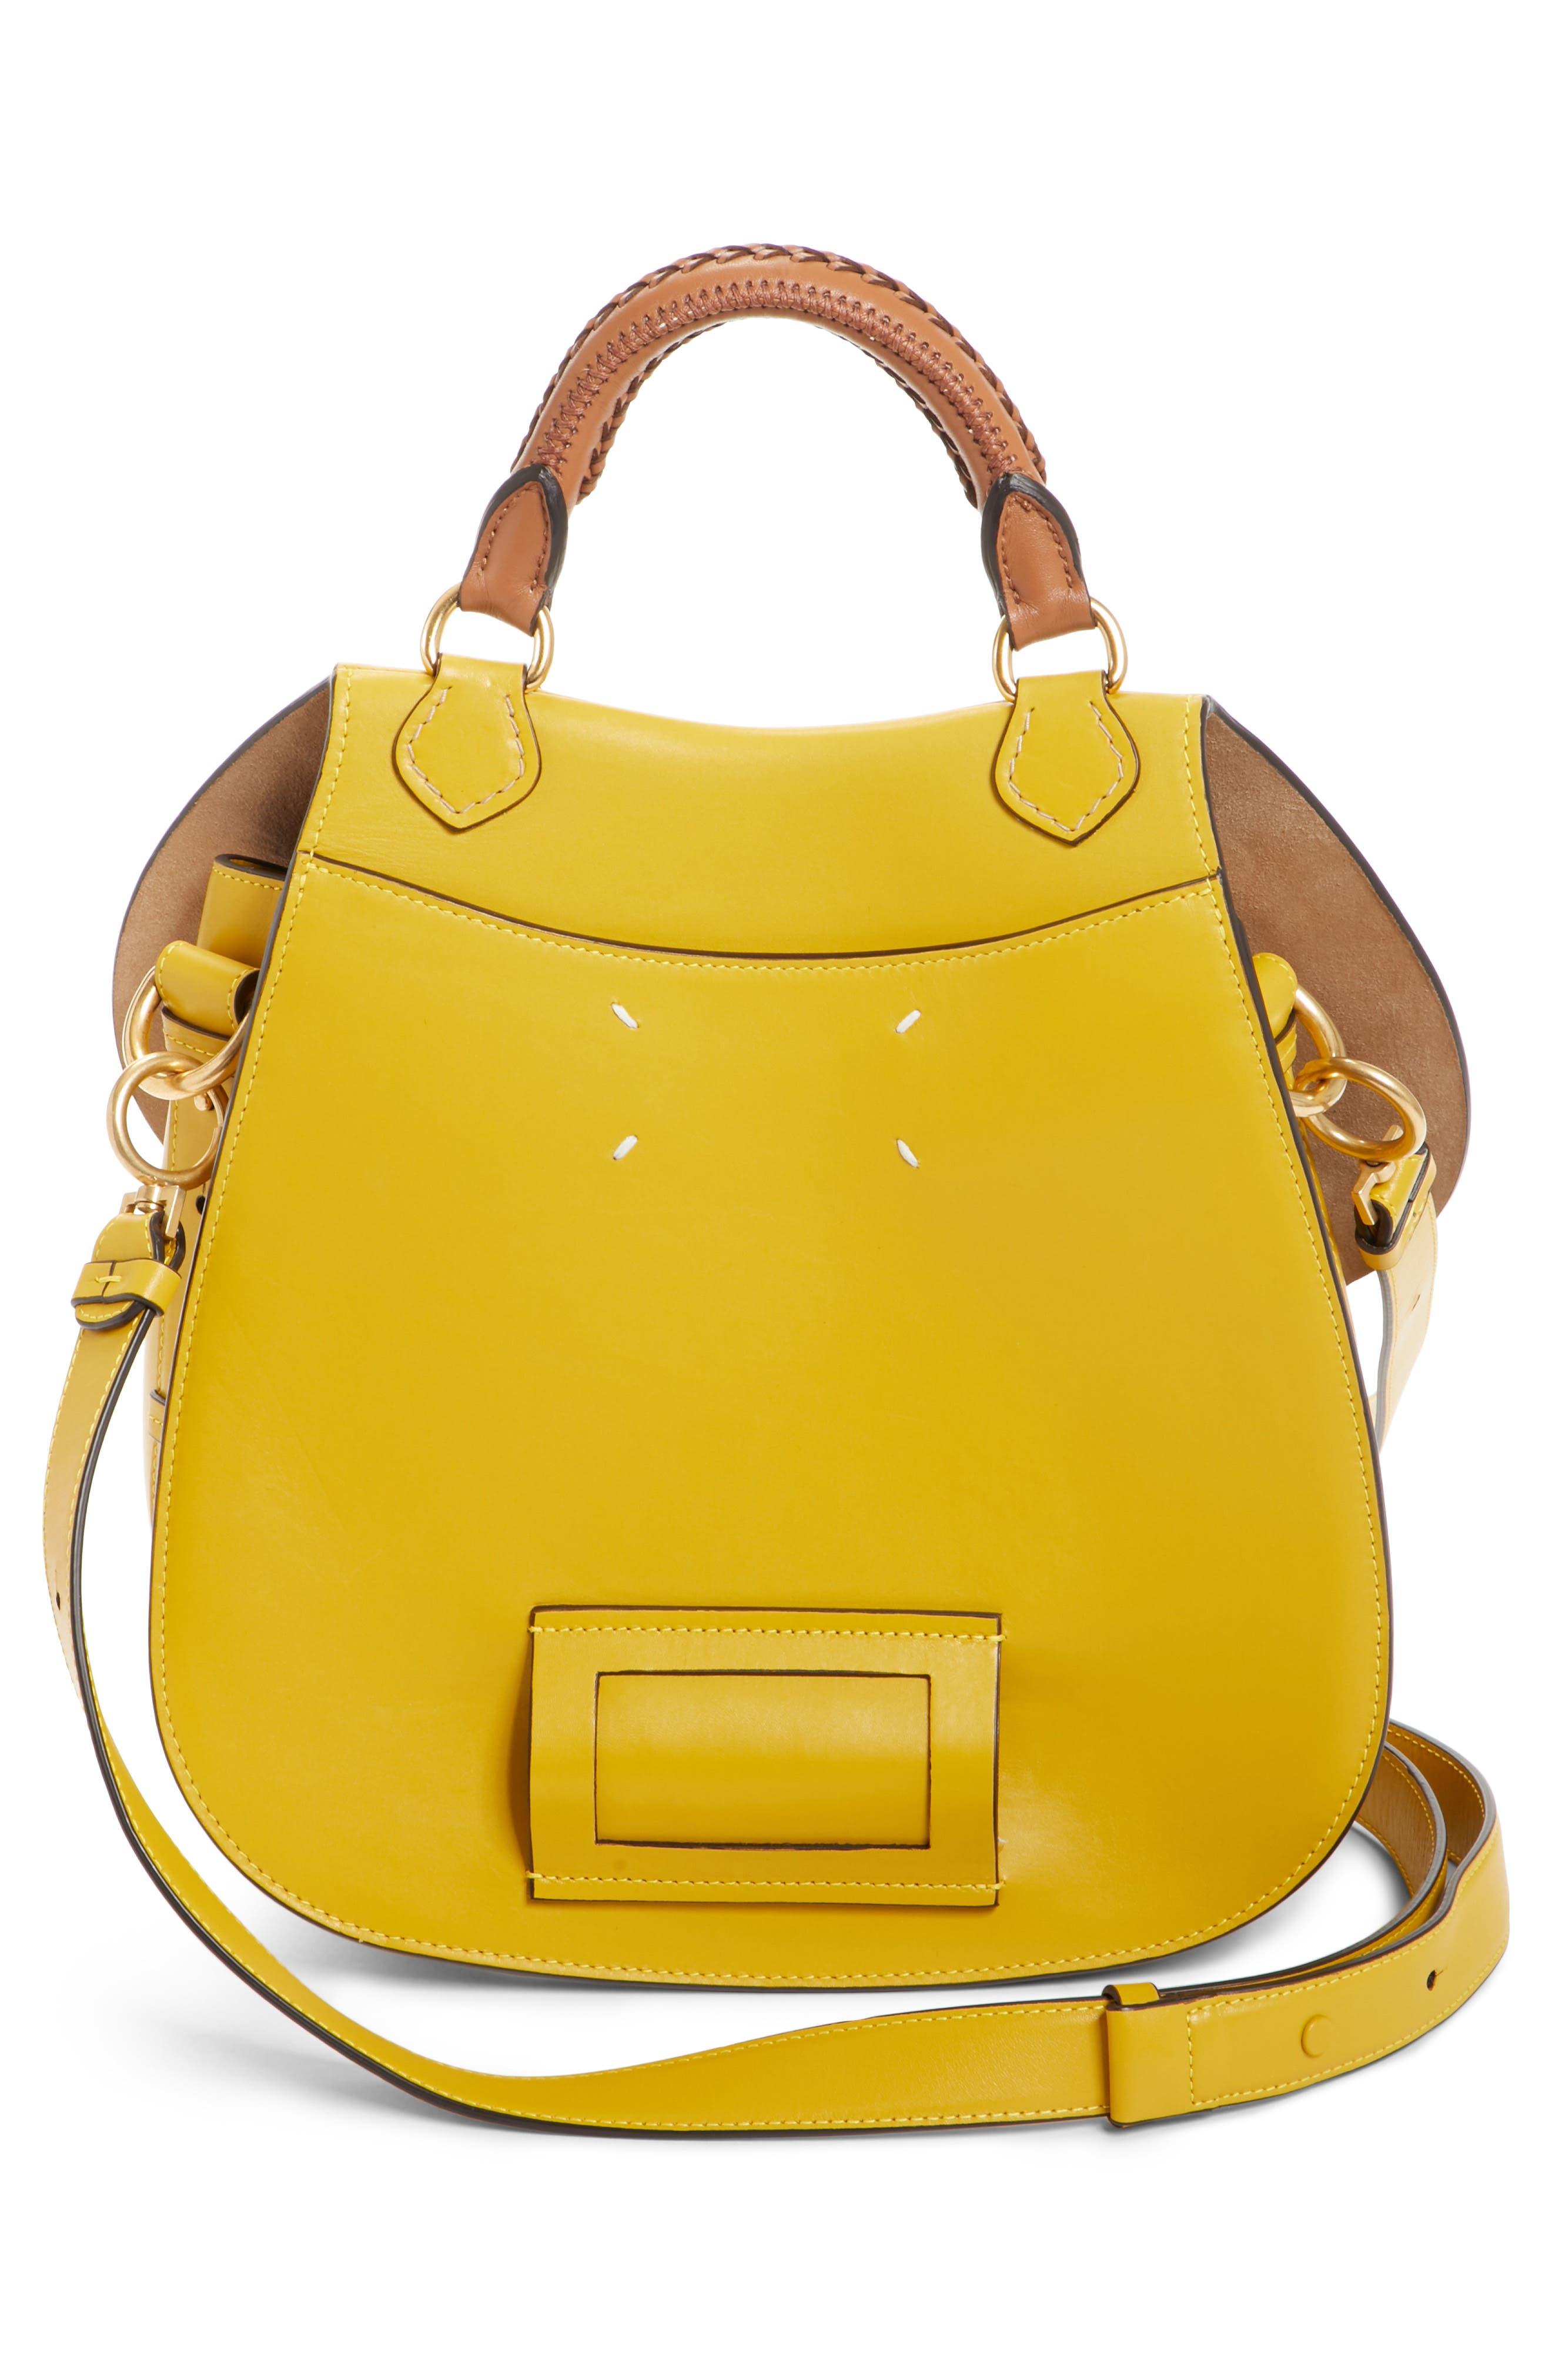 Large Bag Slide Leather Saddle Bag,                             Alternate thumbnail 3, color,                             YELLOW